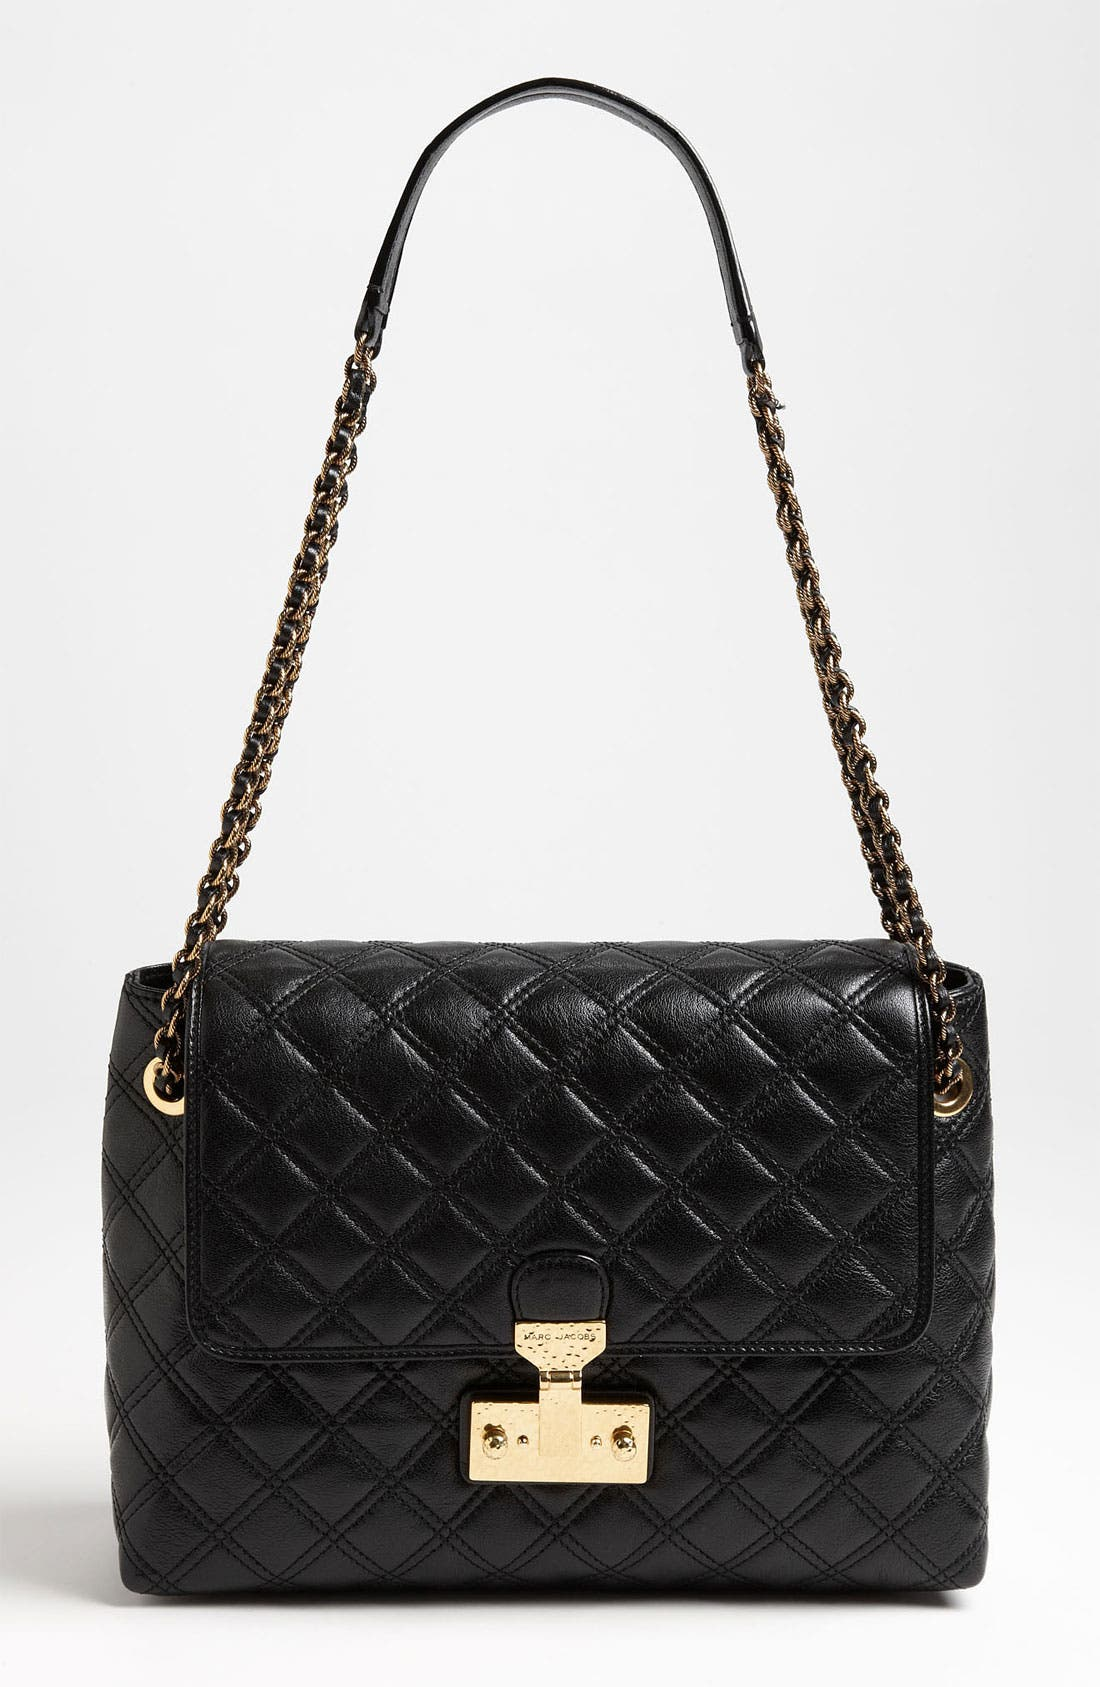 Main Image - MARC JACOBS 'Baroque XL Single' Leather Shoulder Bag